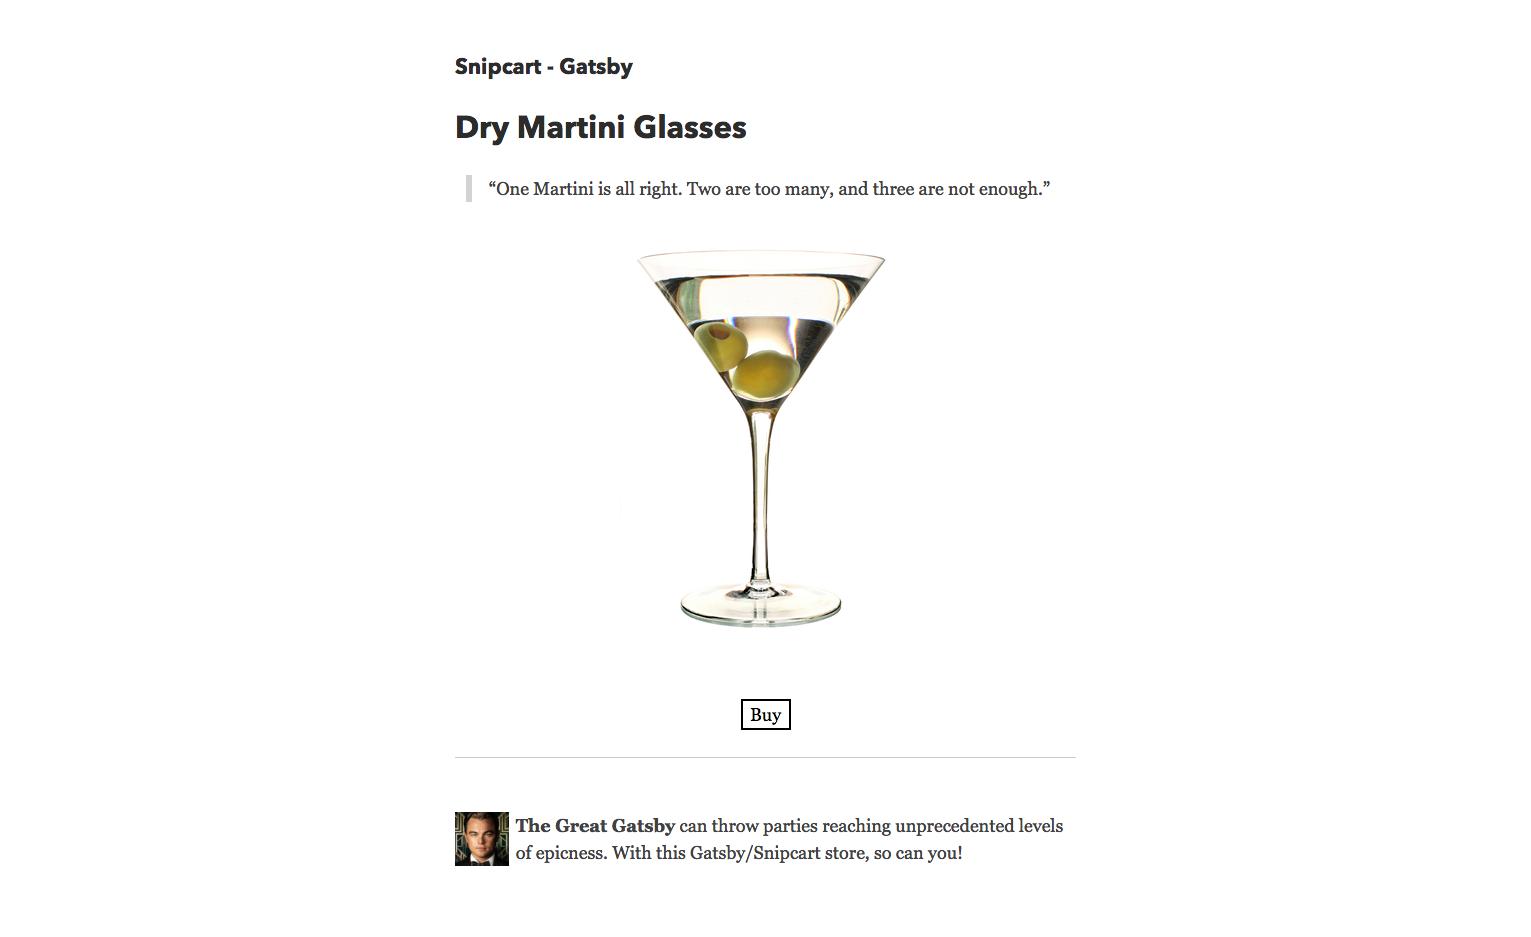 snipcart-reactjs-static-ecommerce-dry-martini-glasses